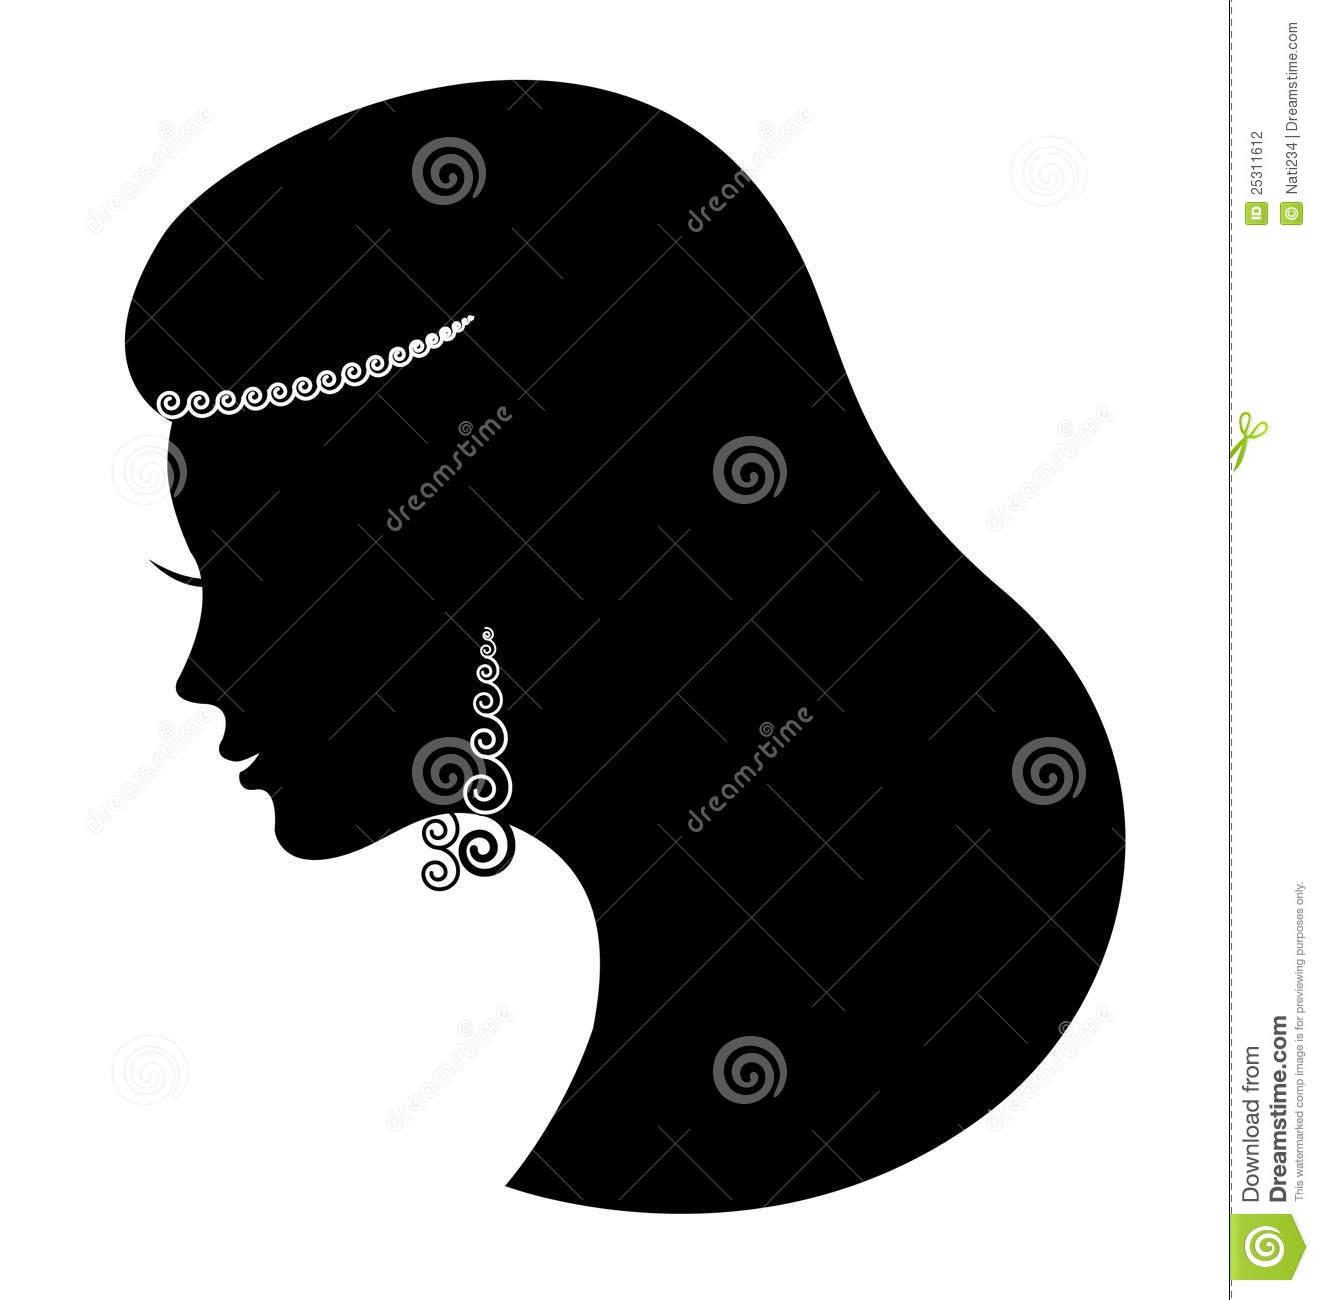 jewelry silhouette clip art - photo #29